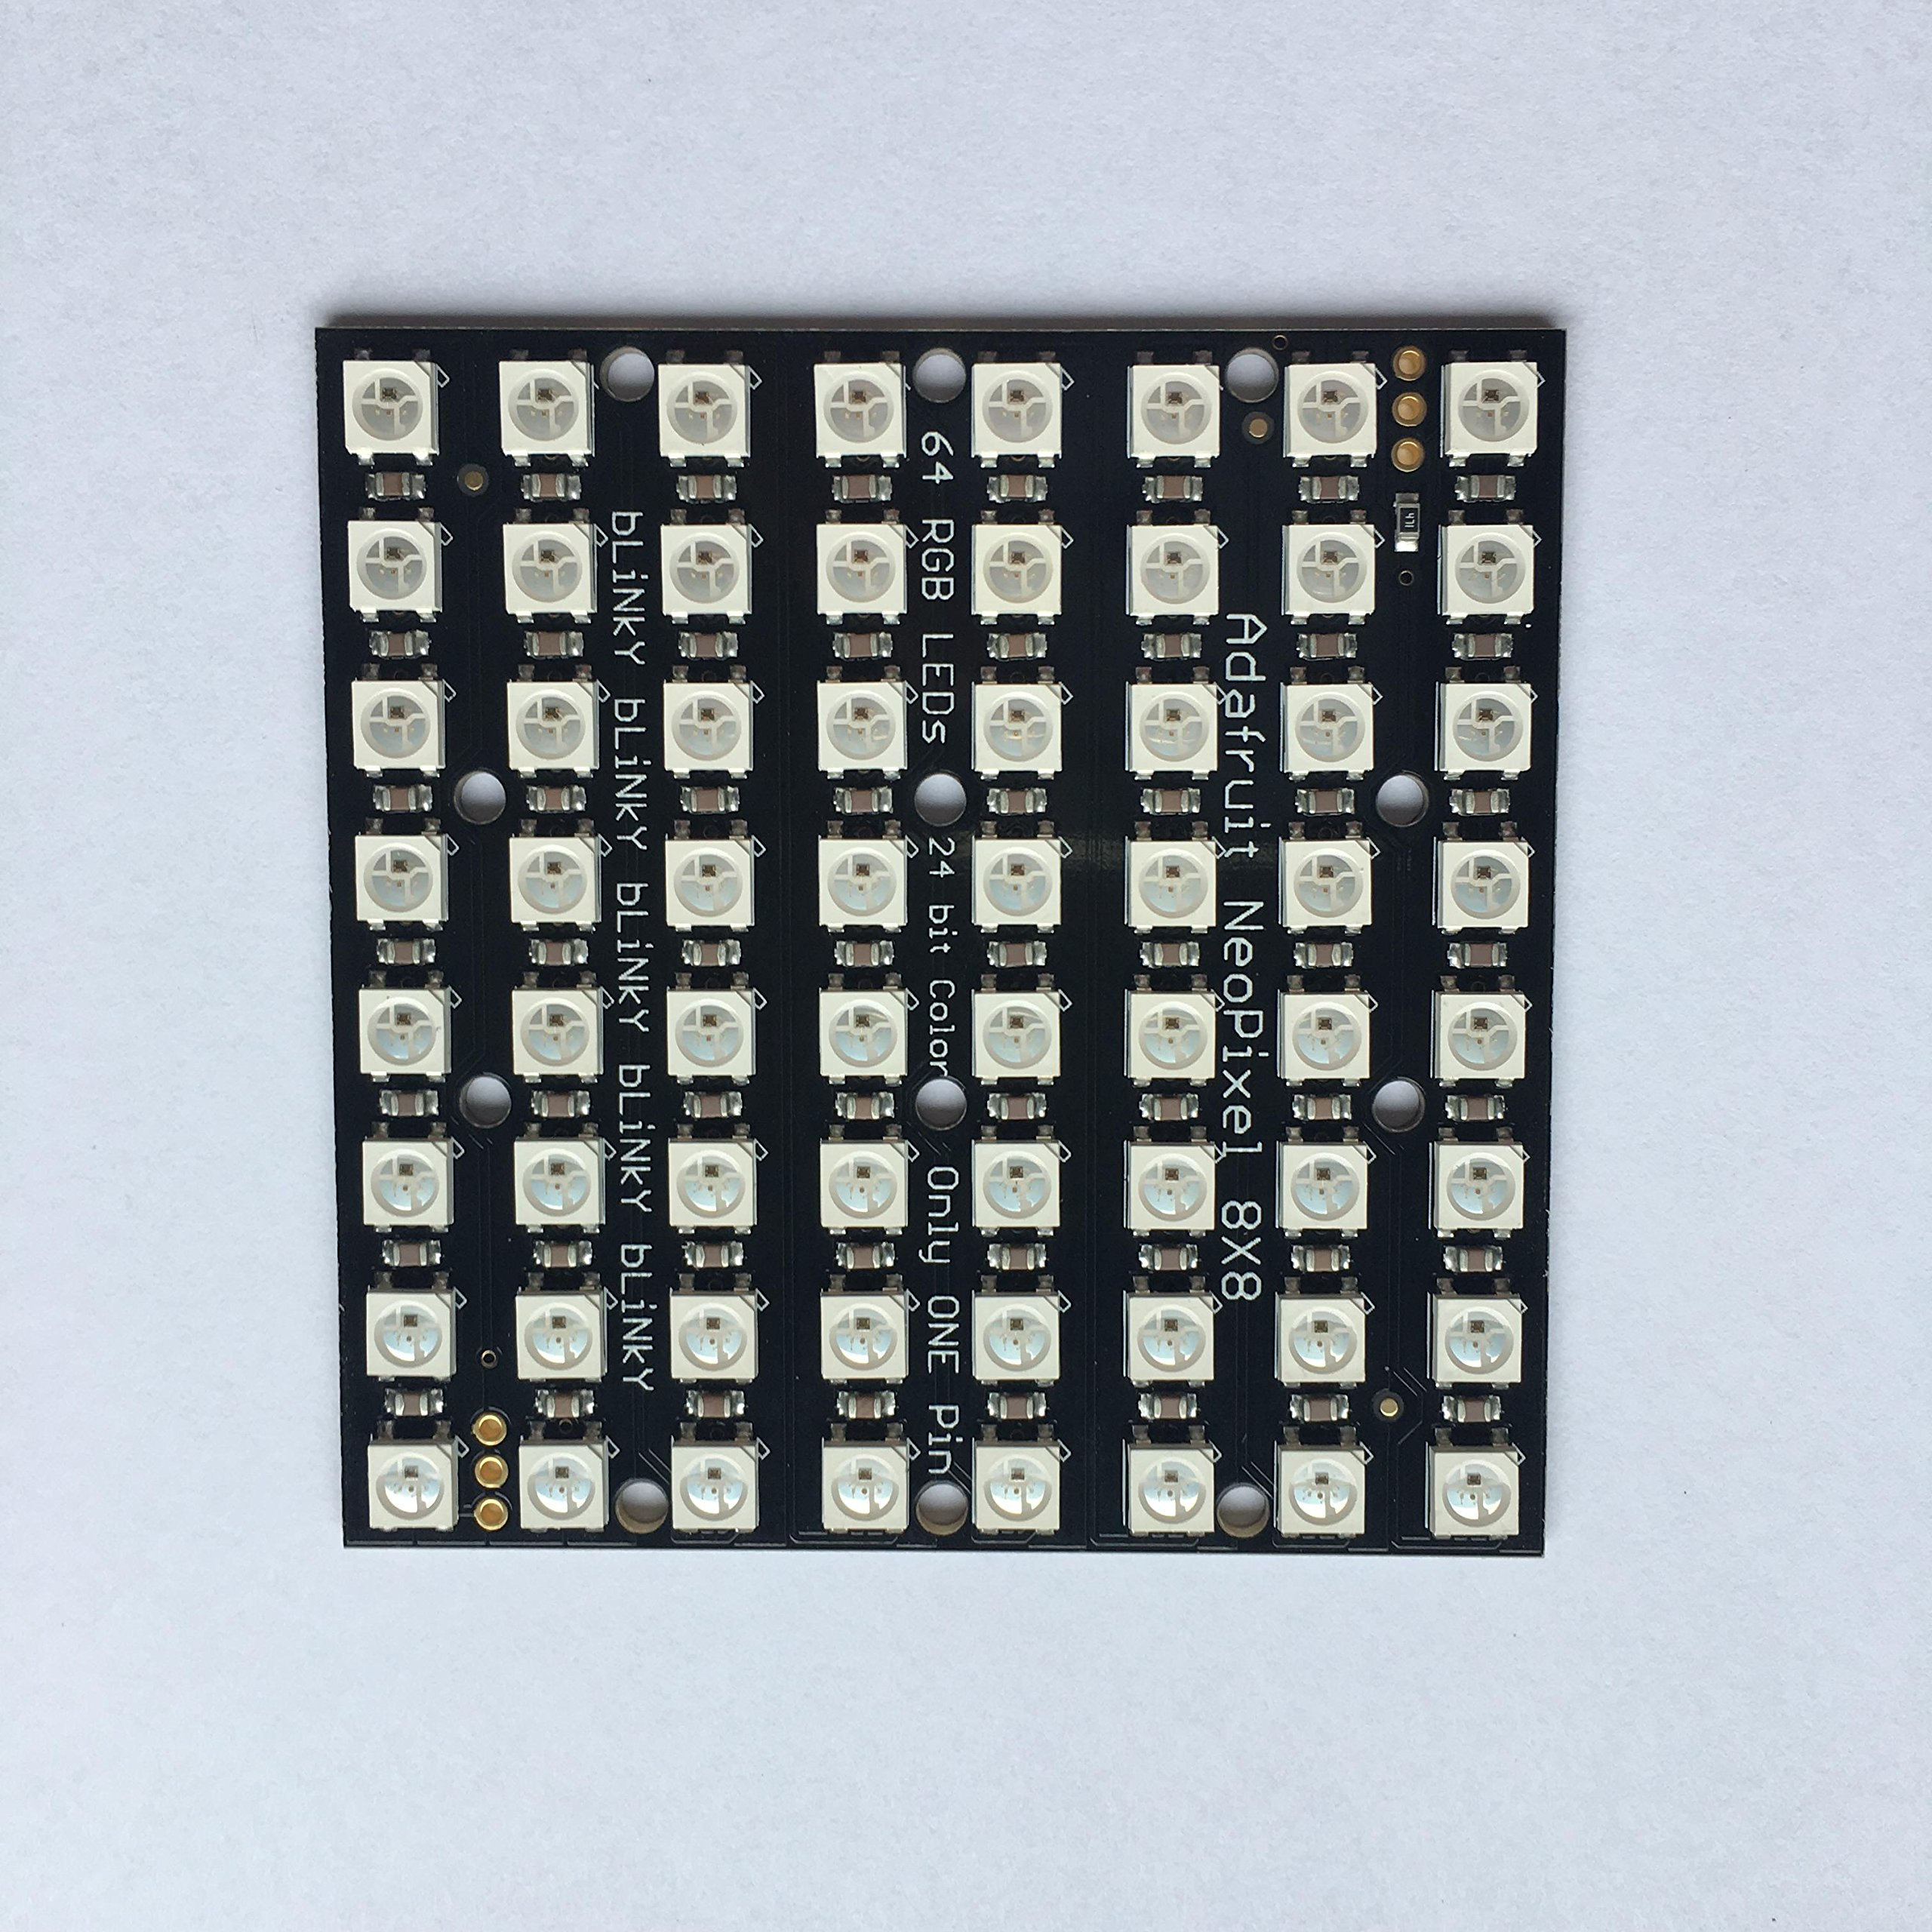 Adafruit NeoPixel NeoMatrix 8x8-64 RGB LED Pixel Matrix [ADA